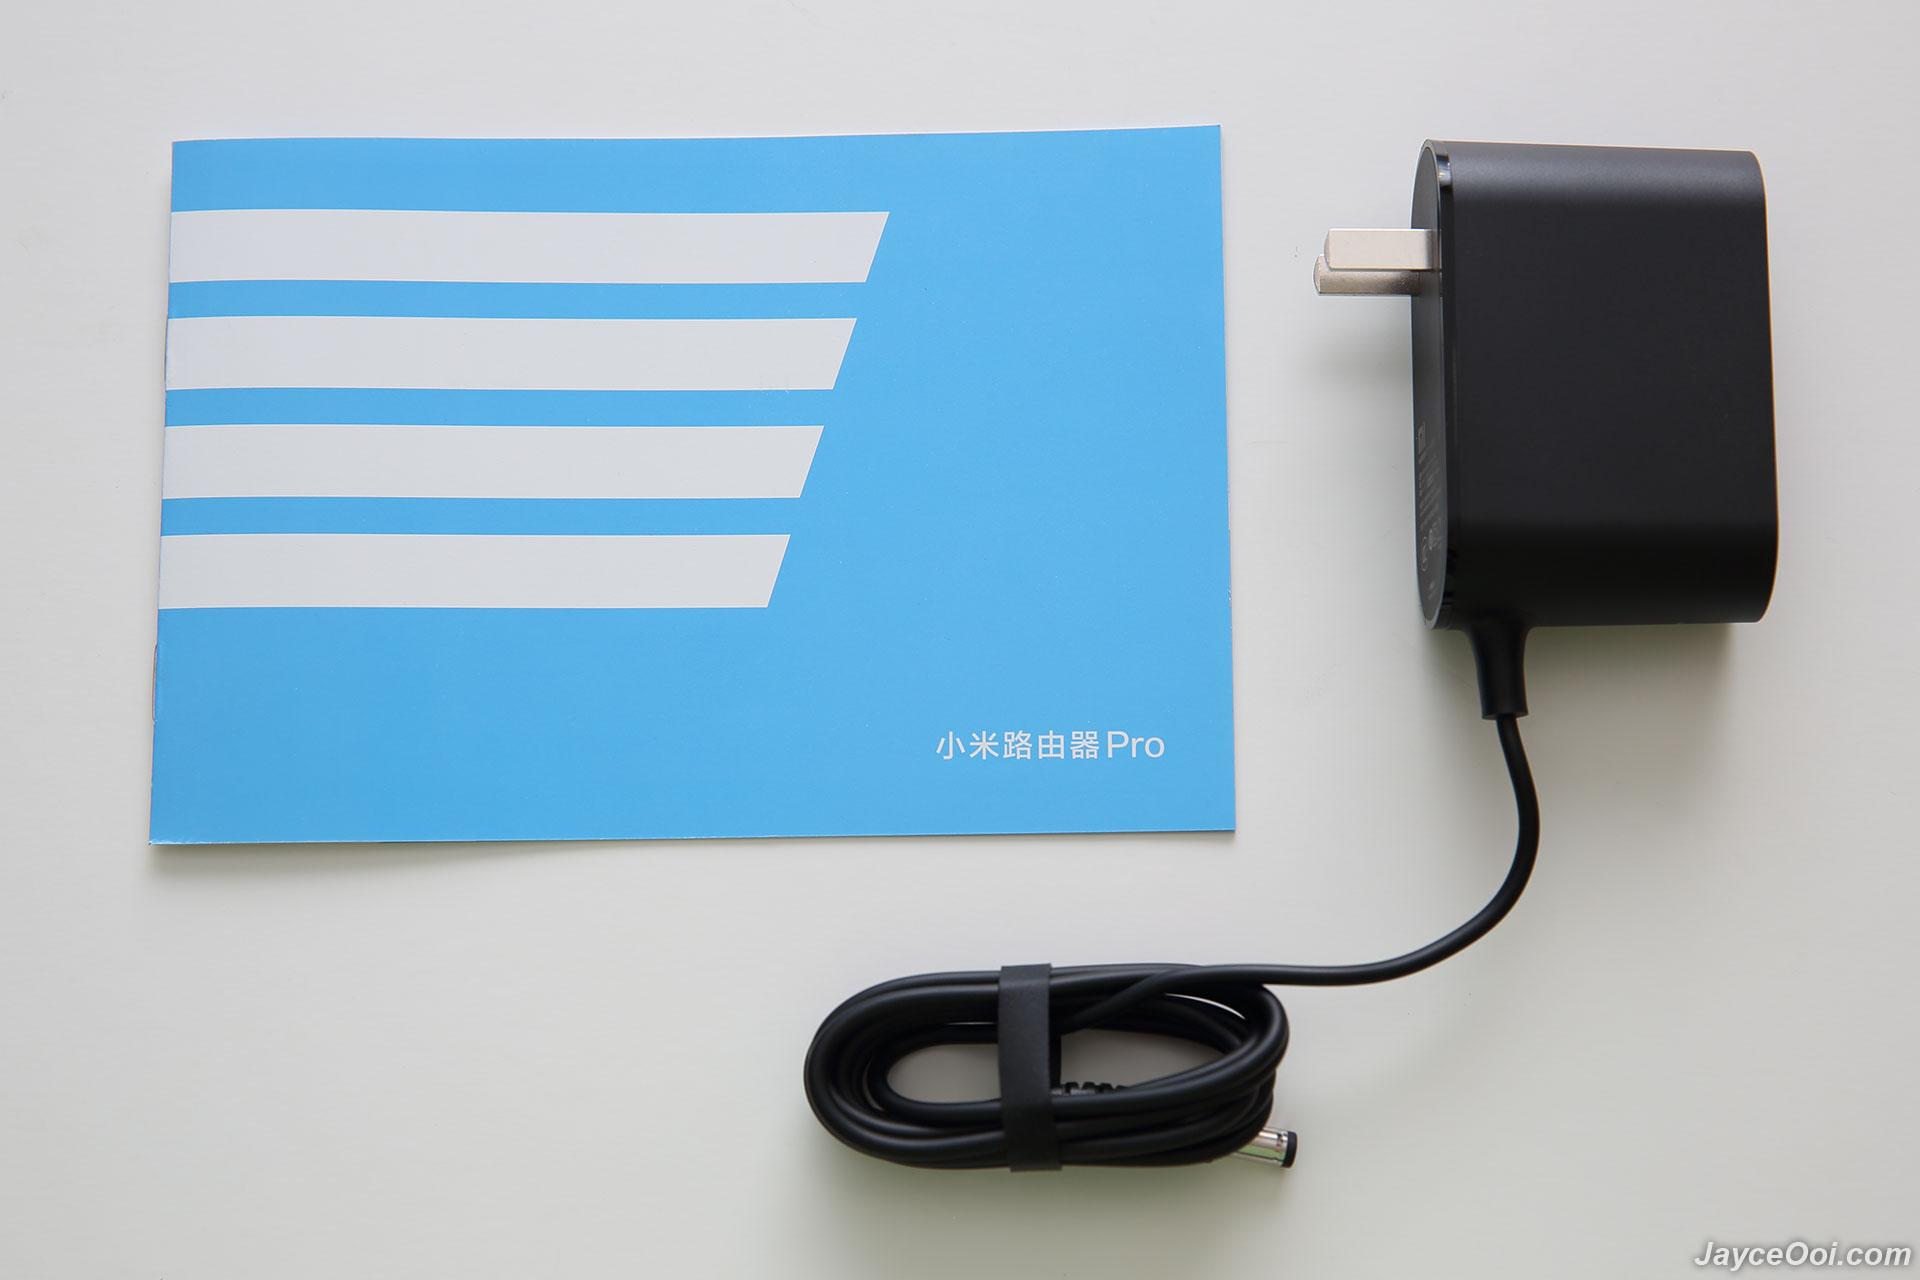 Xiaomi Wireless Router Pro